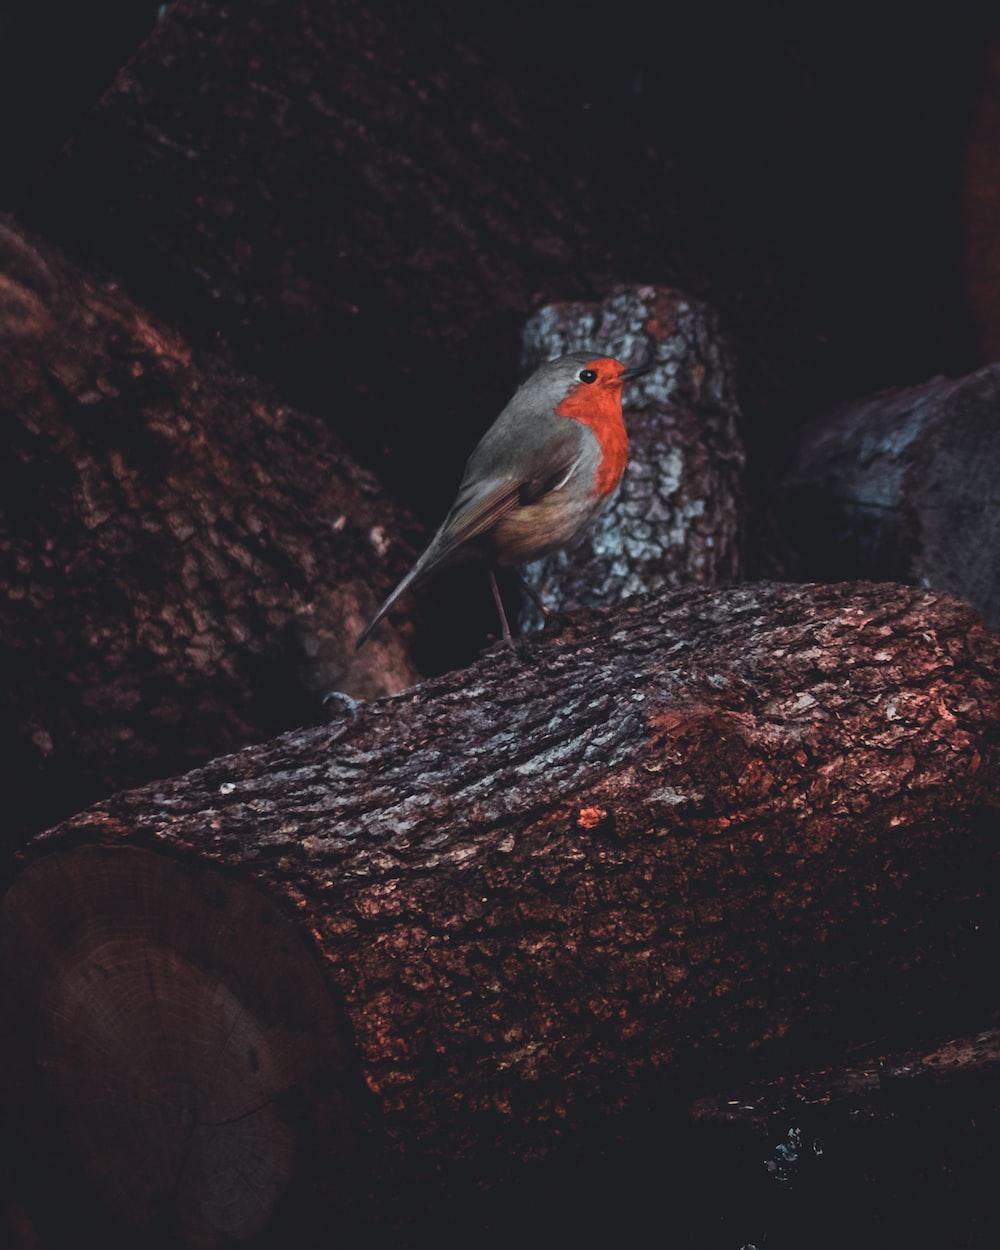 gray and orange bird on tree